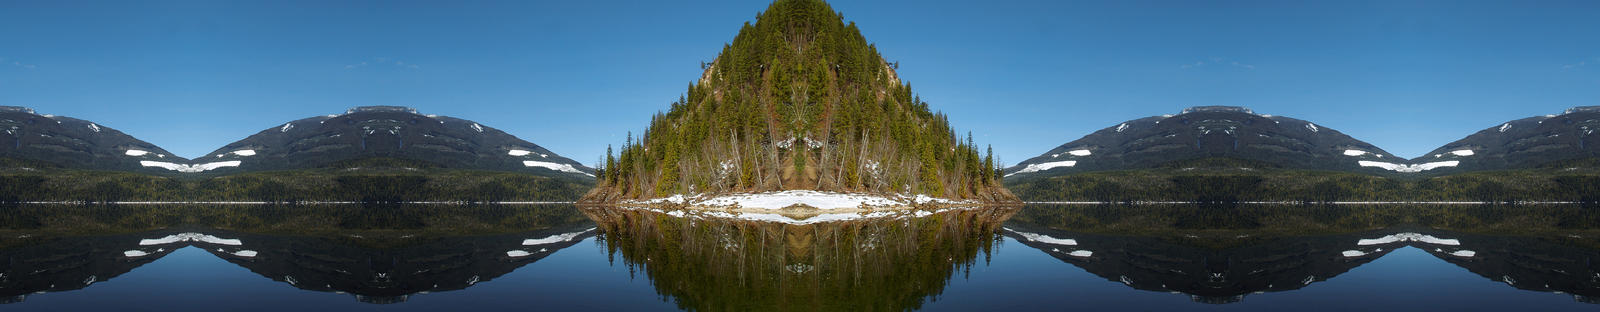 The Island by infinityloop